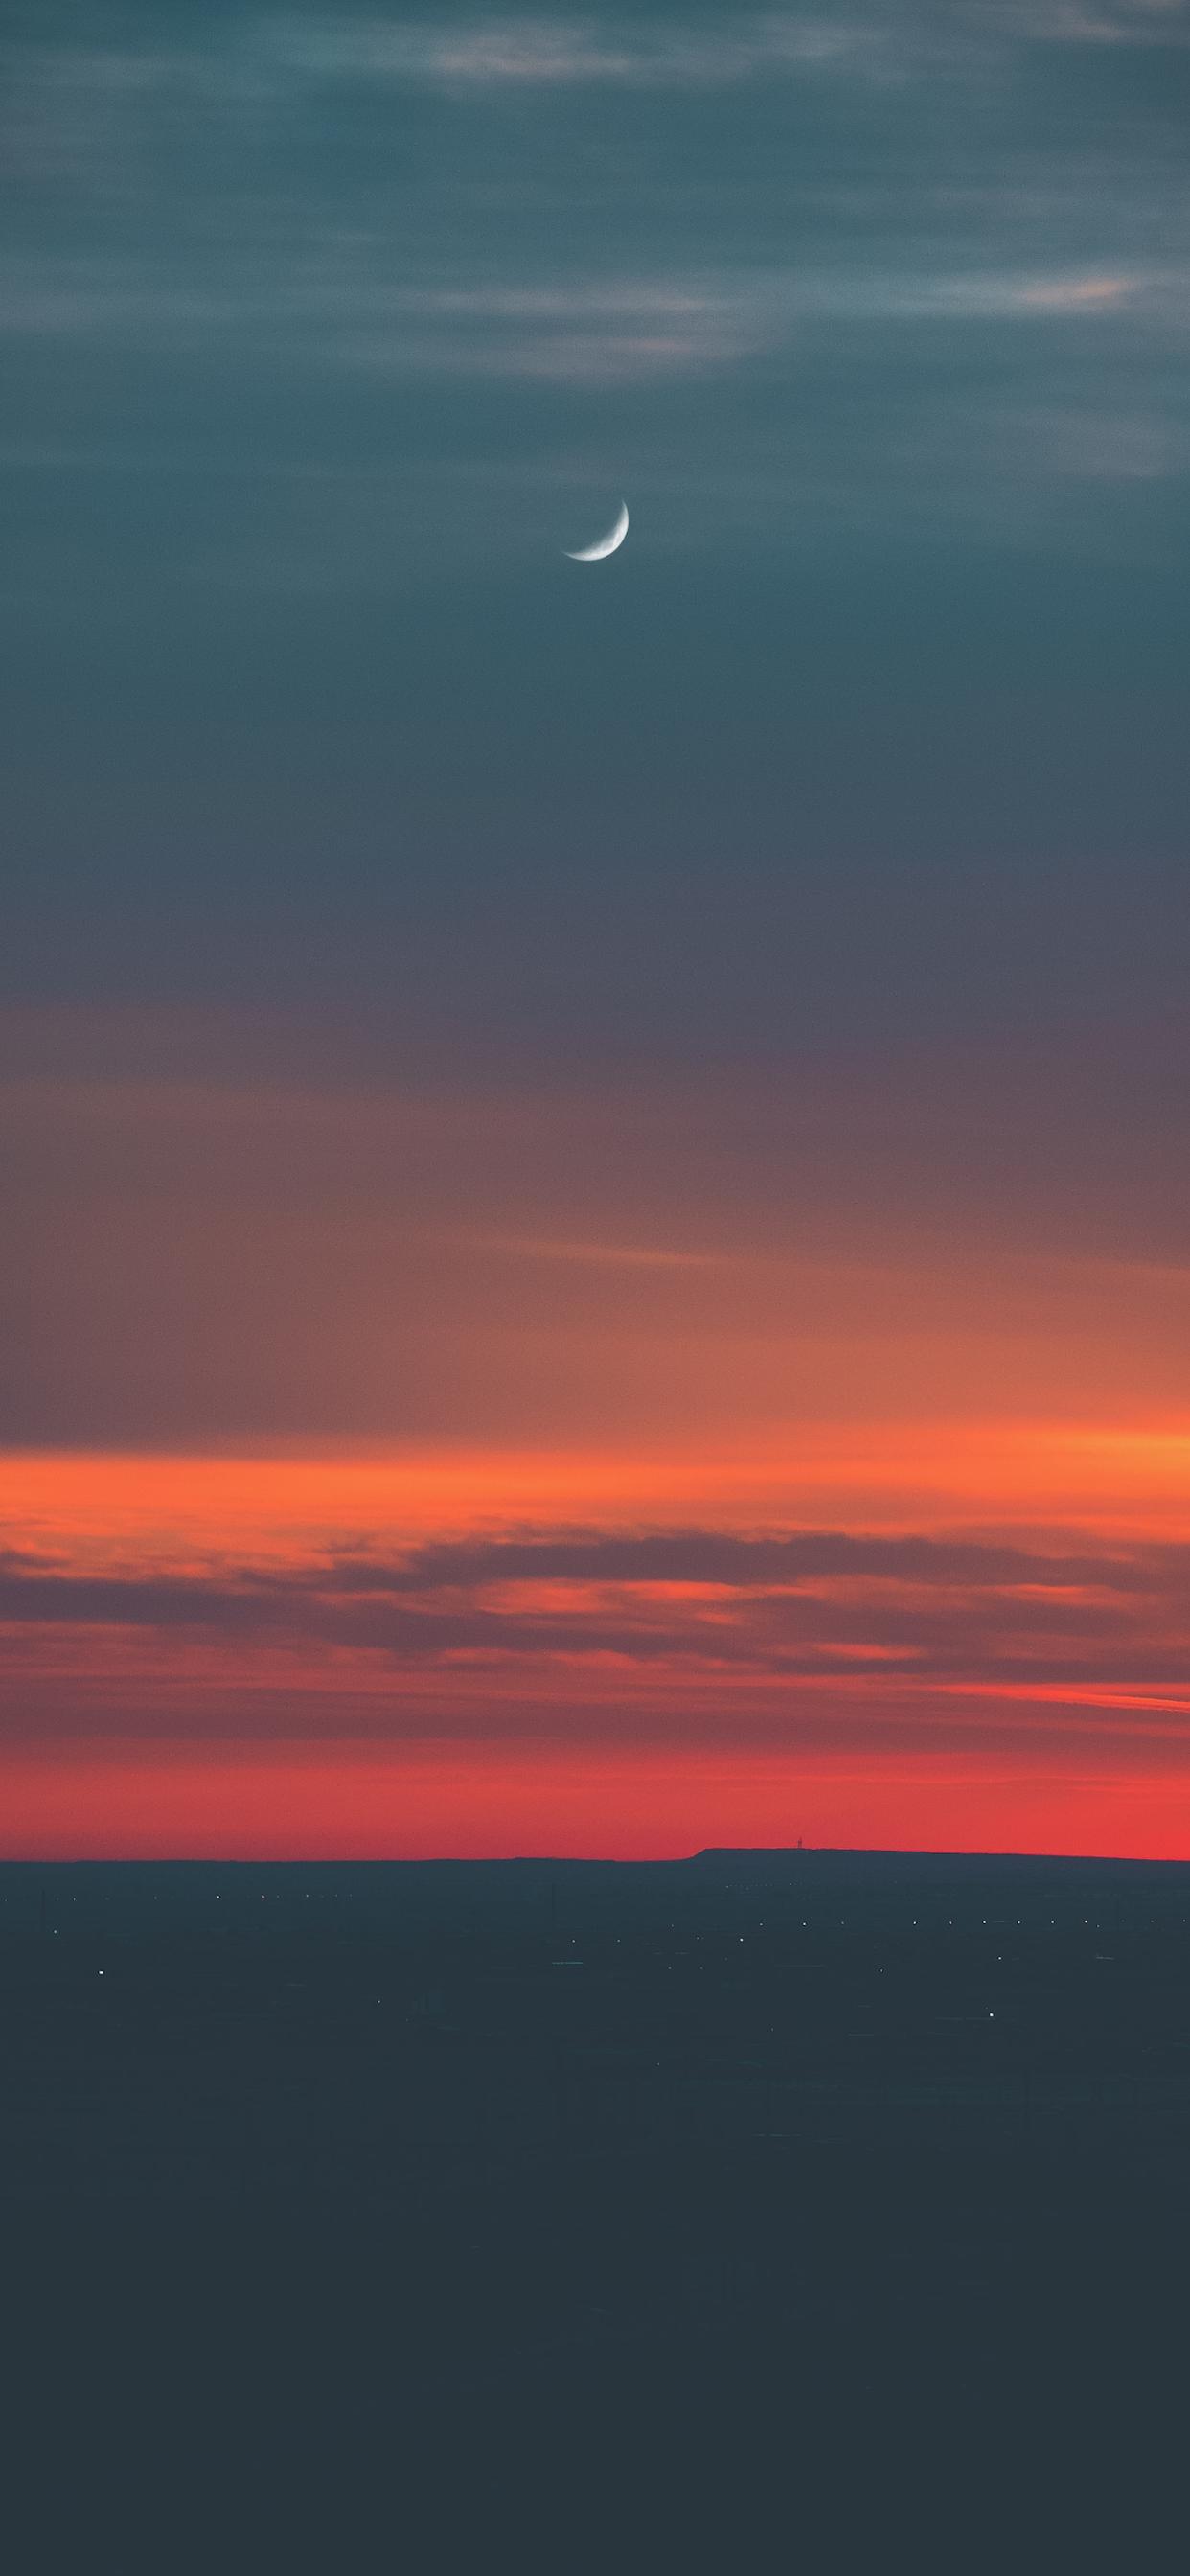 iPhone wallpapers moon sunset Fonds d'écran iPhone du 19/02/2020